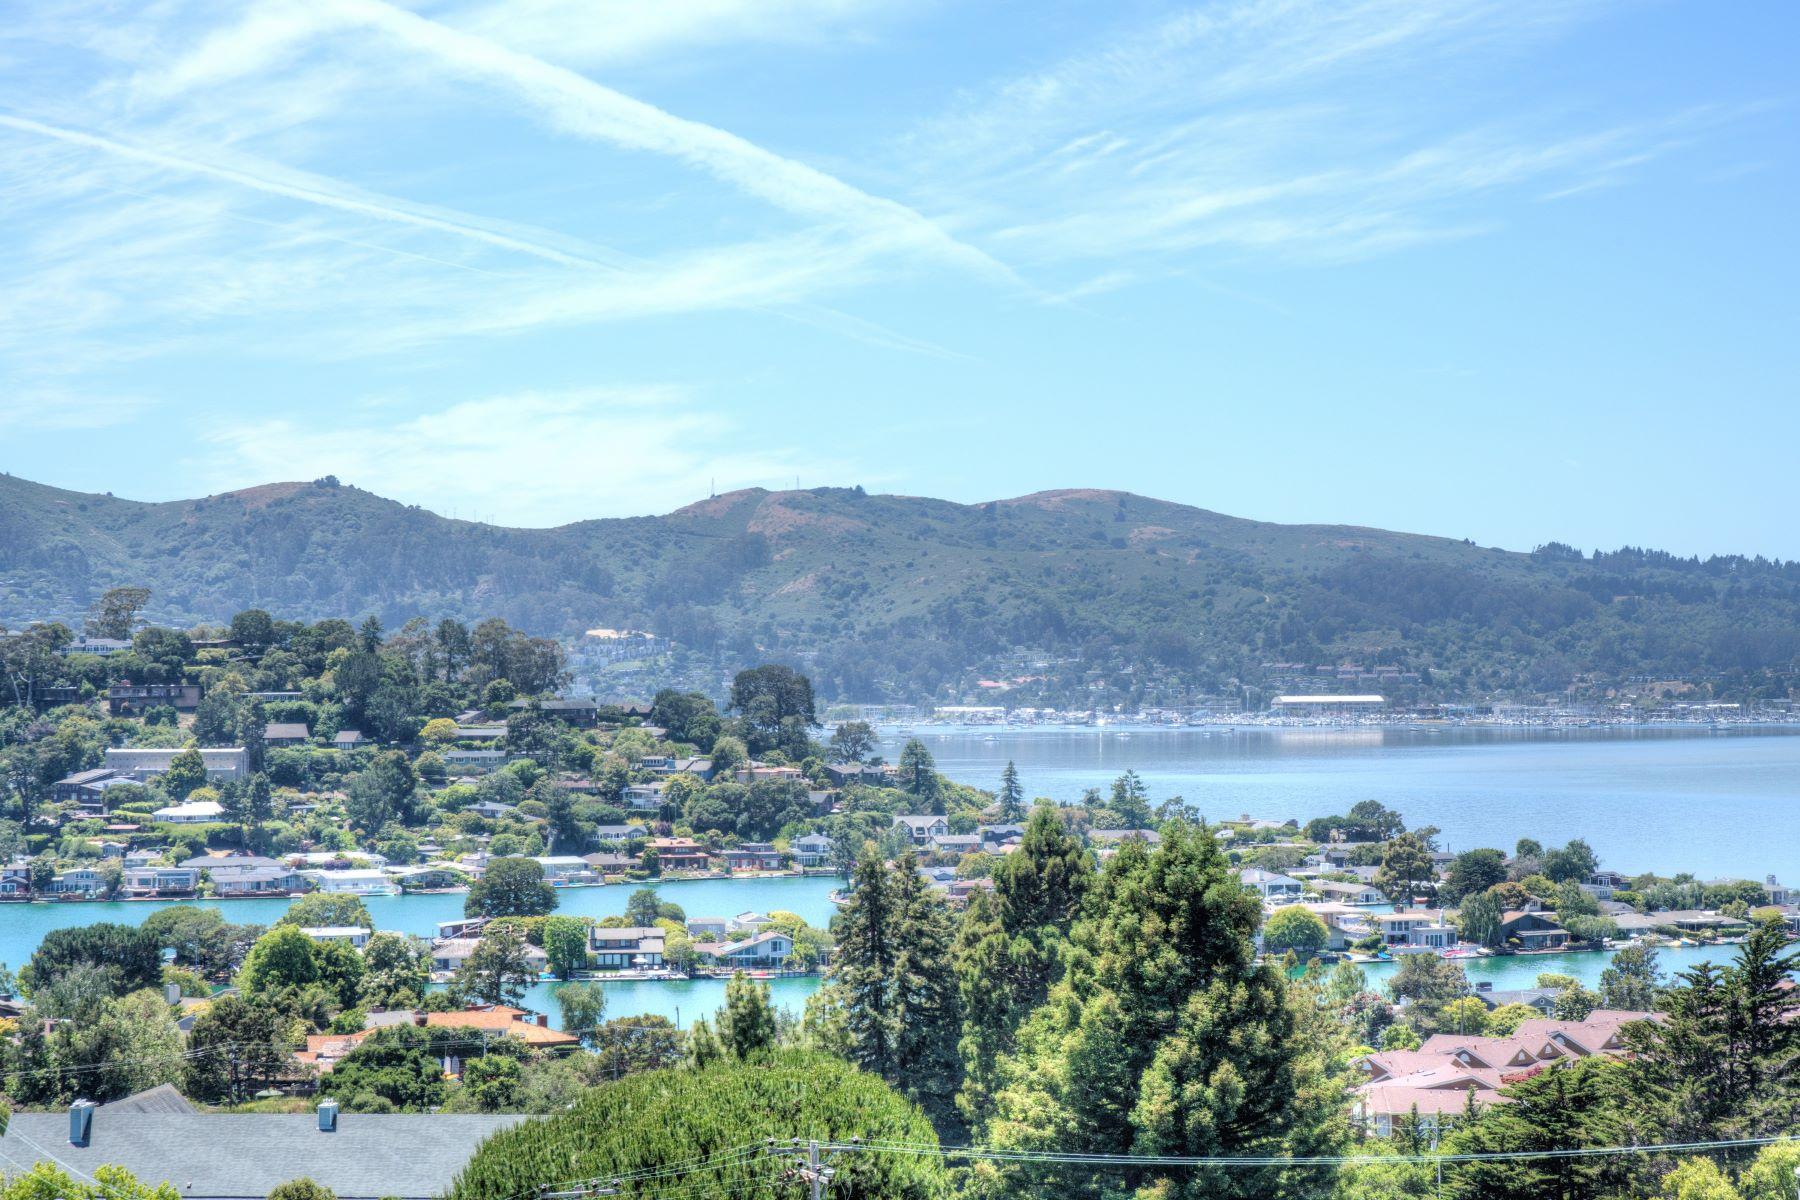 Property for Sale at Gorgeous Panoramic Views 126 Marinero Circle Tiburon, California 94920 United States